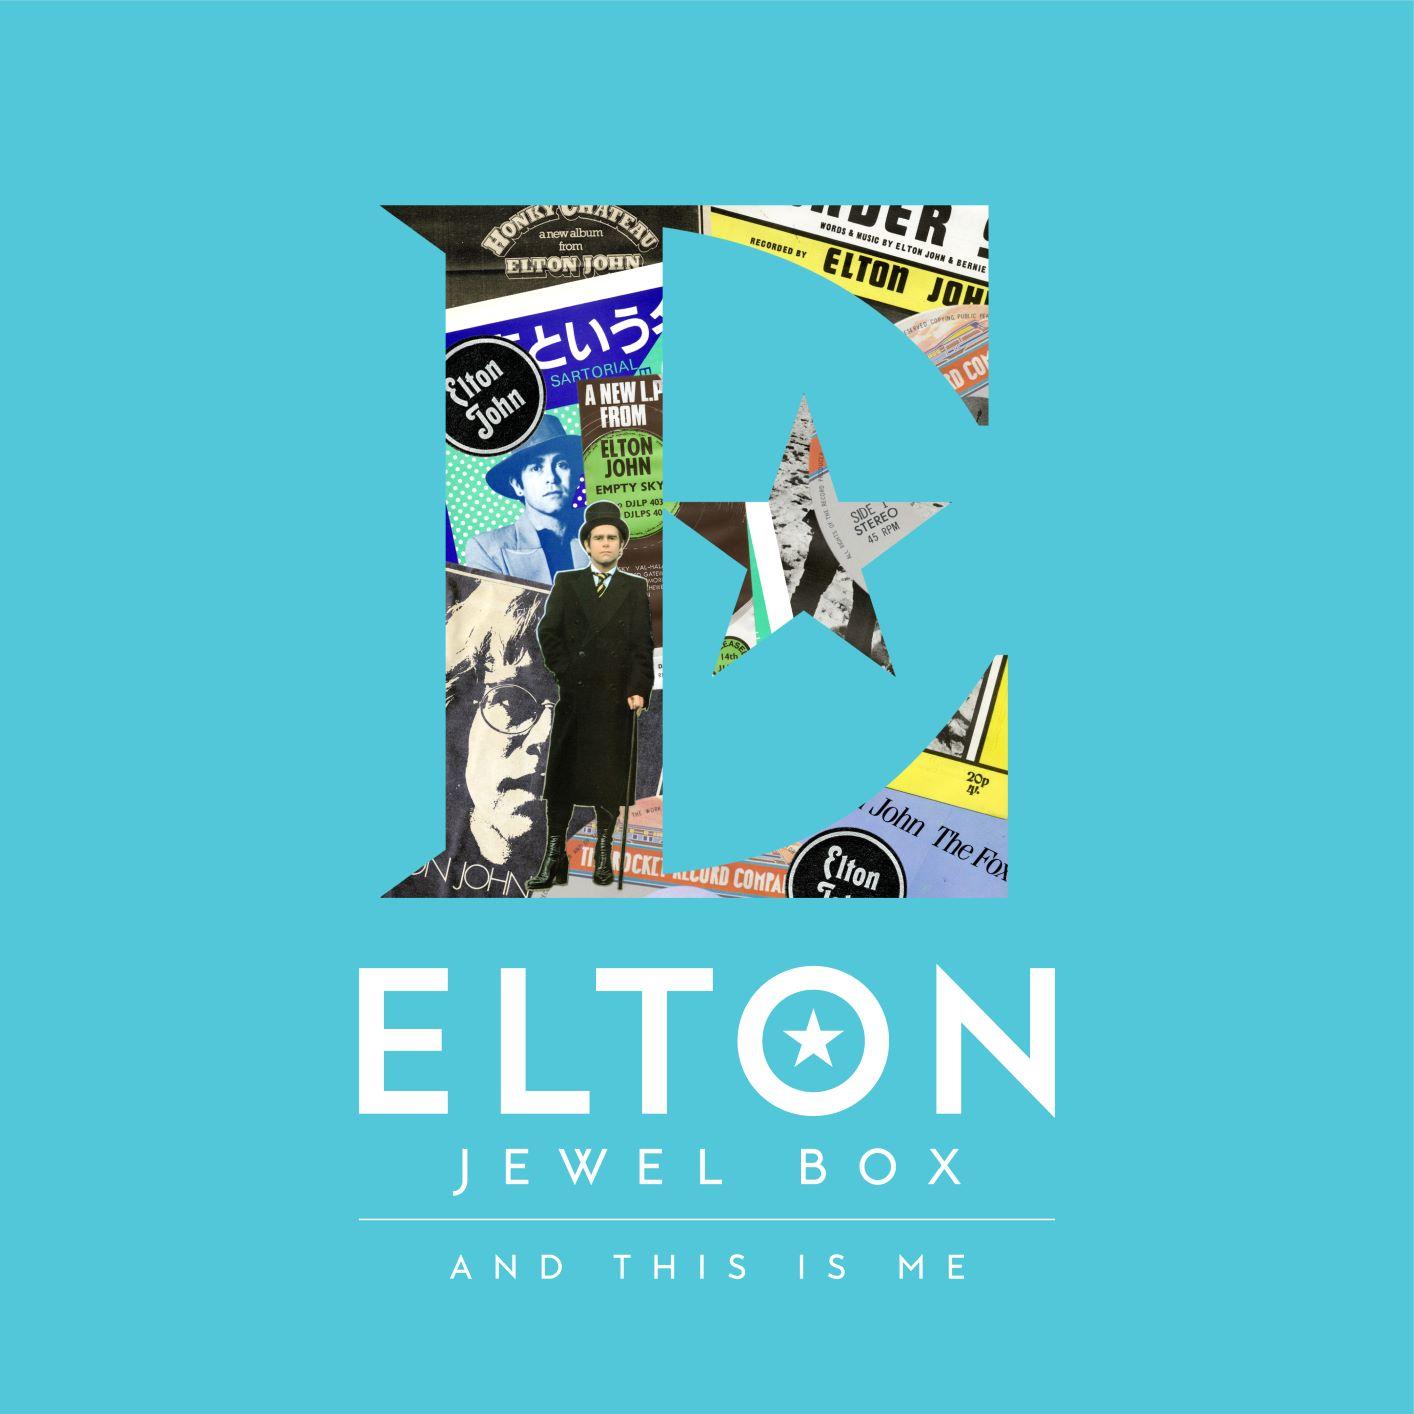 Elton John - Jewel Box